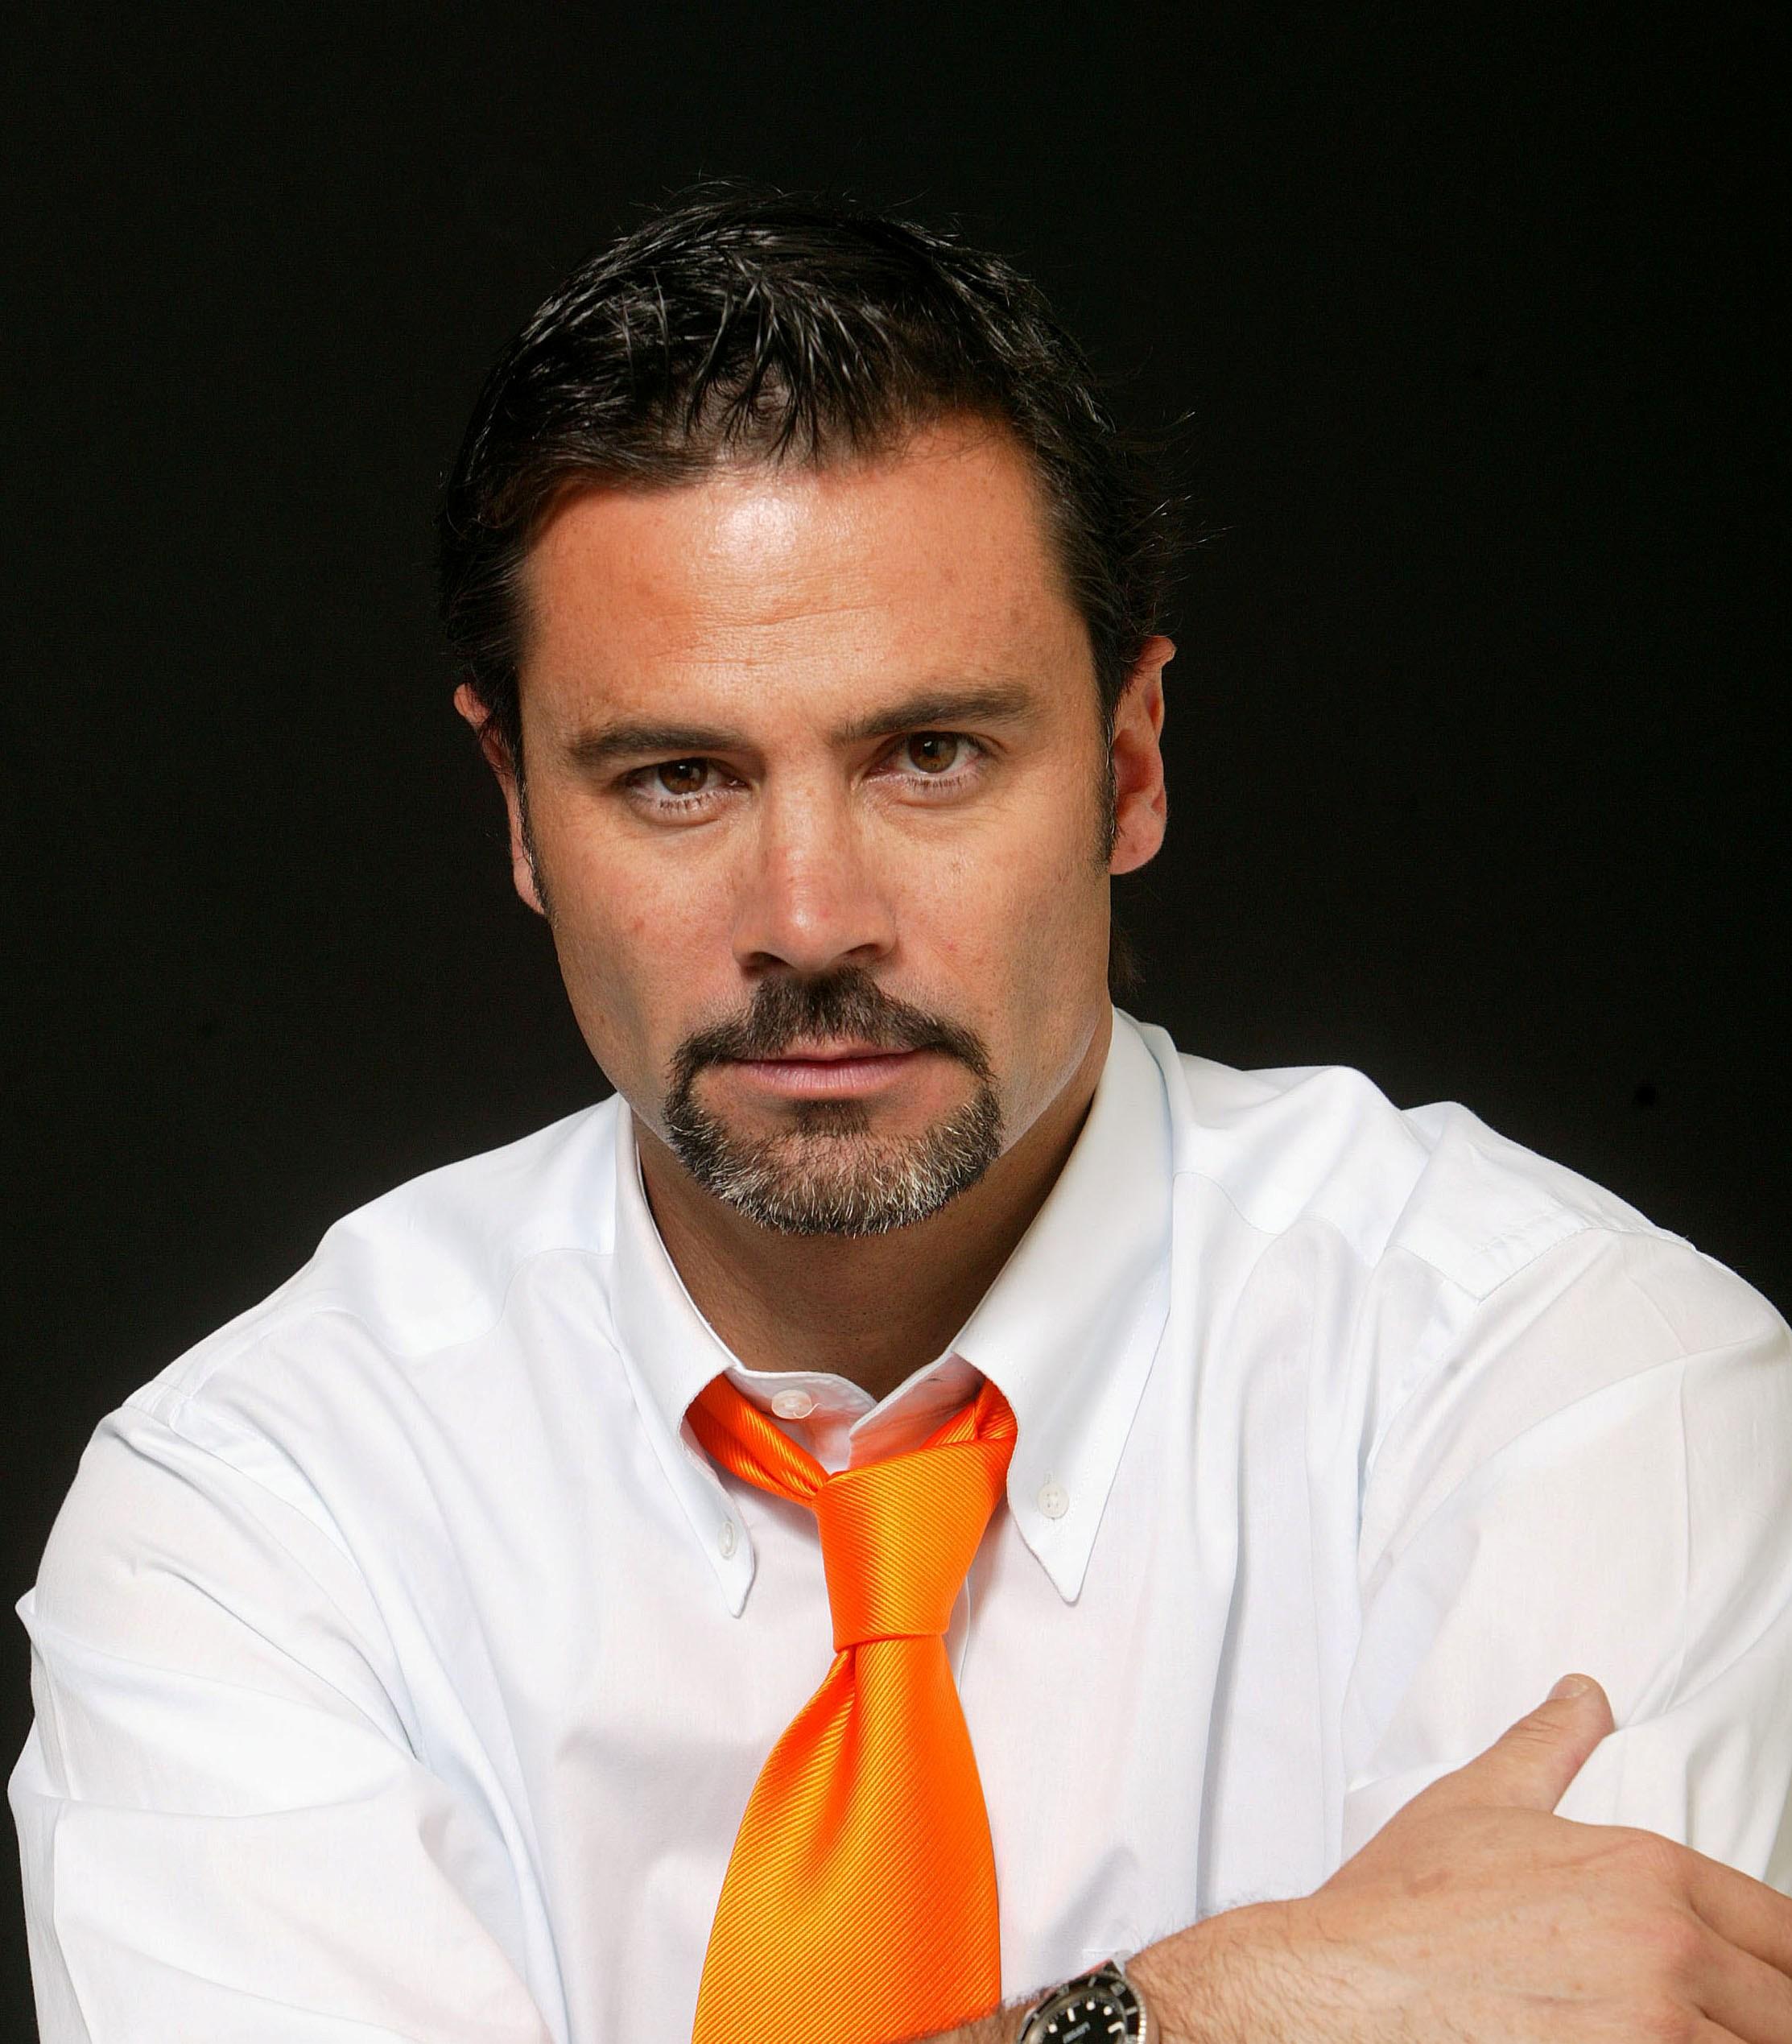 Felipe Camiroaga | Celebrities lists. Felipe